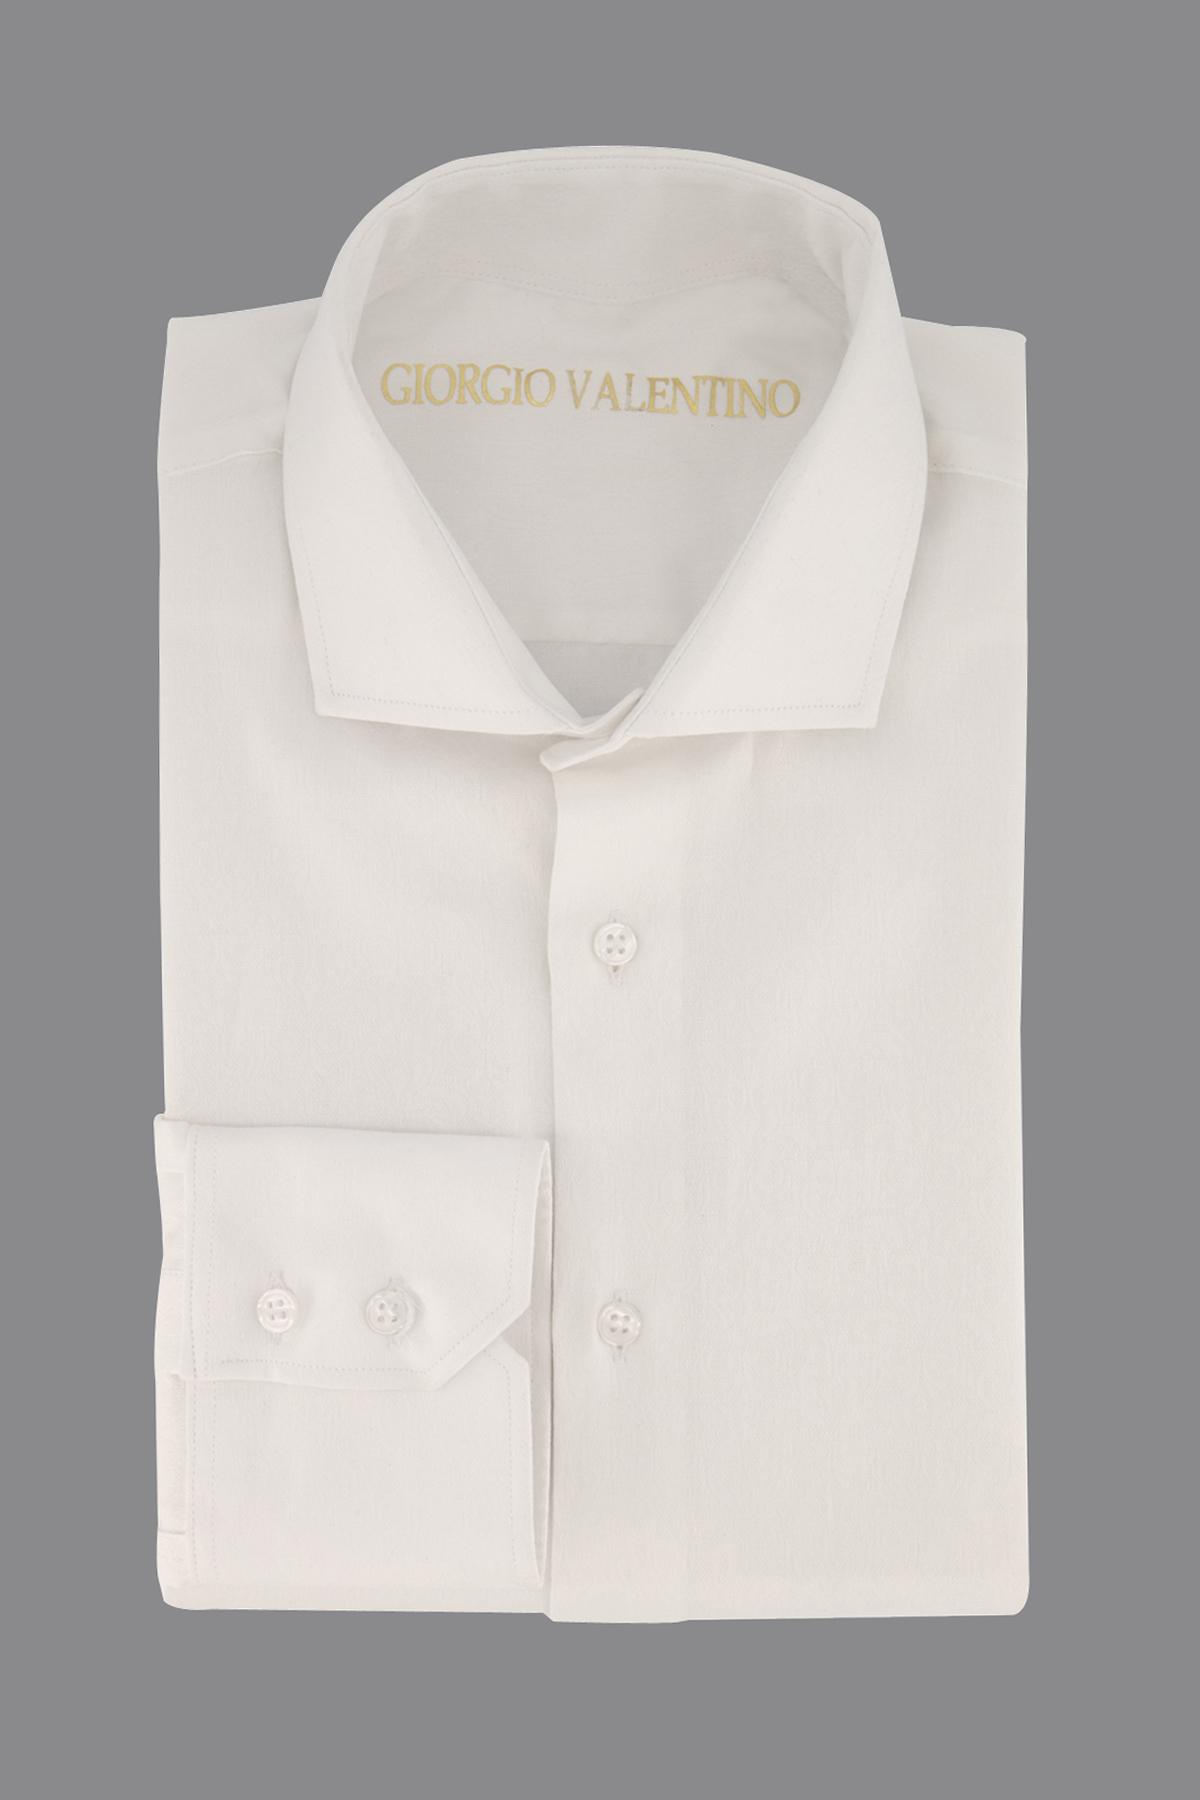 Camisa Giorgio Valentino, tela italiana, slim fit, jacquard blanca.